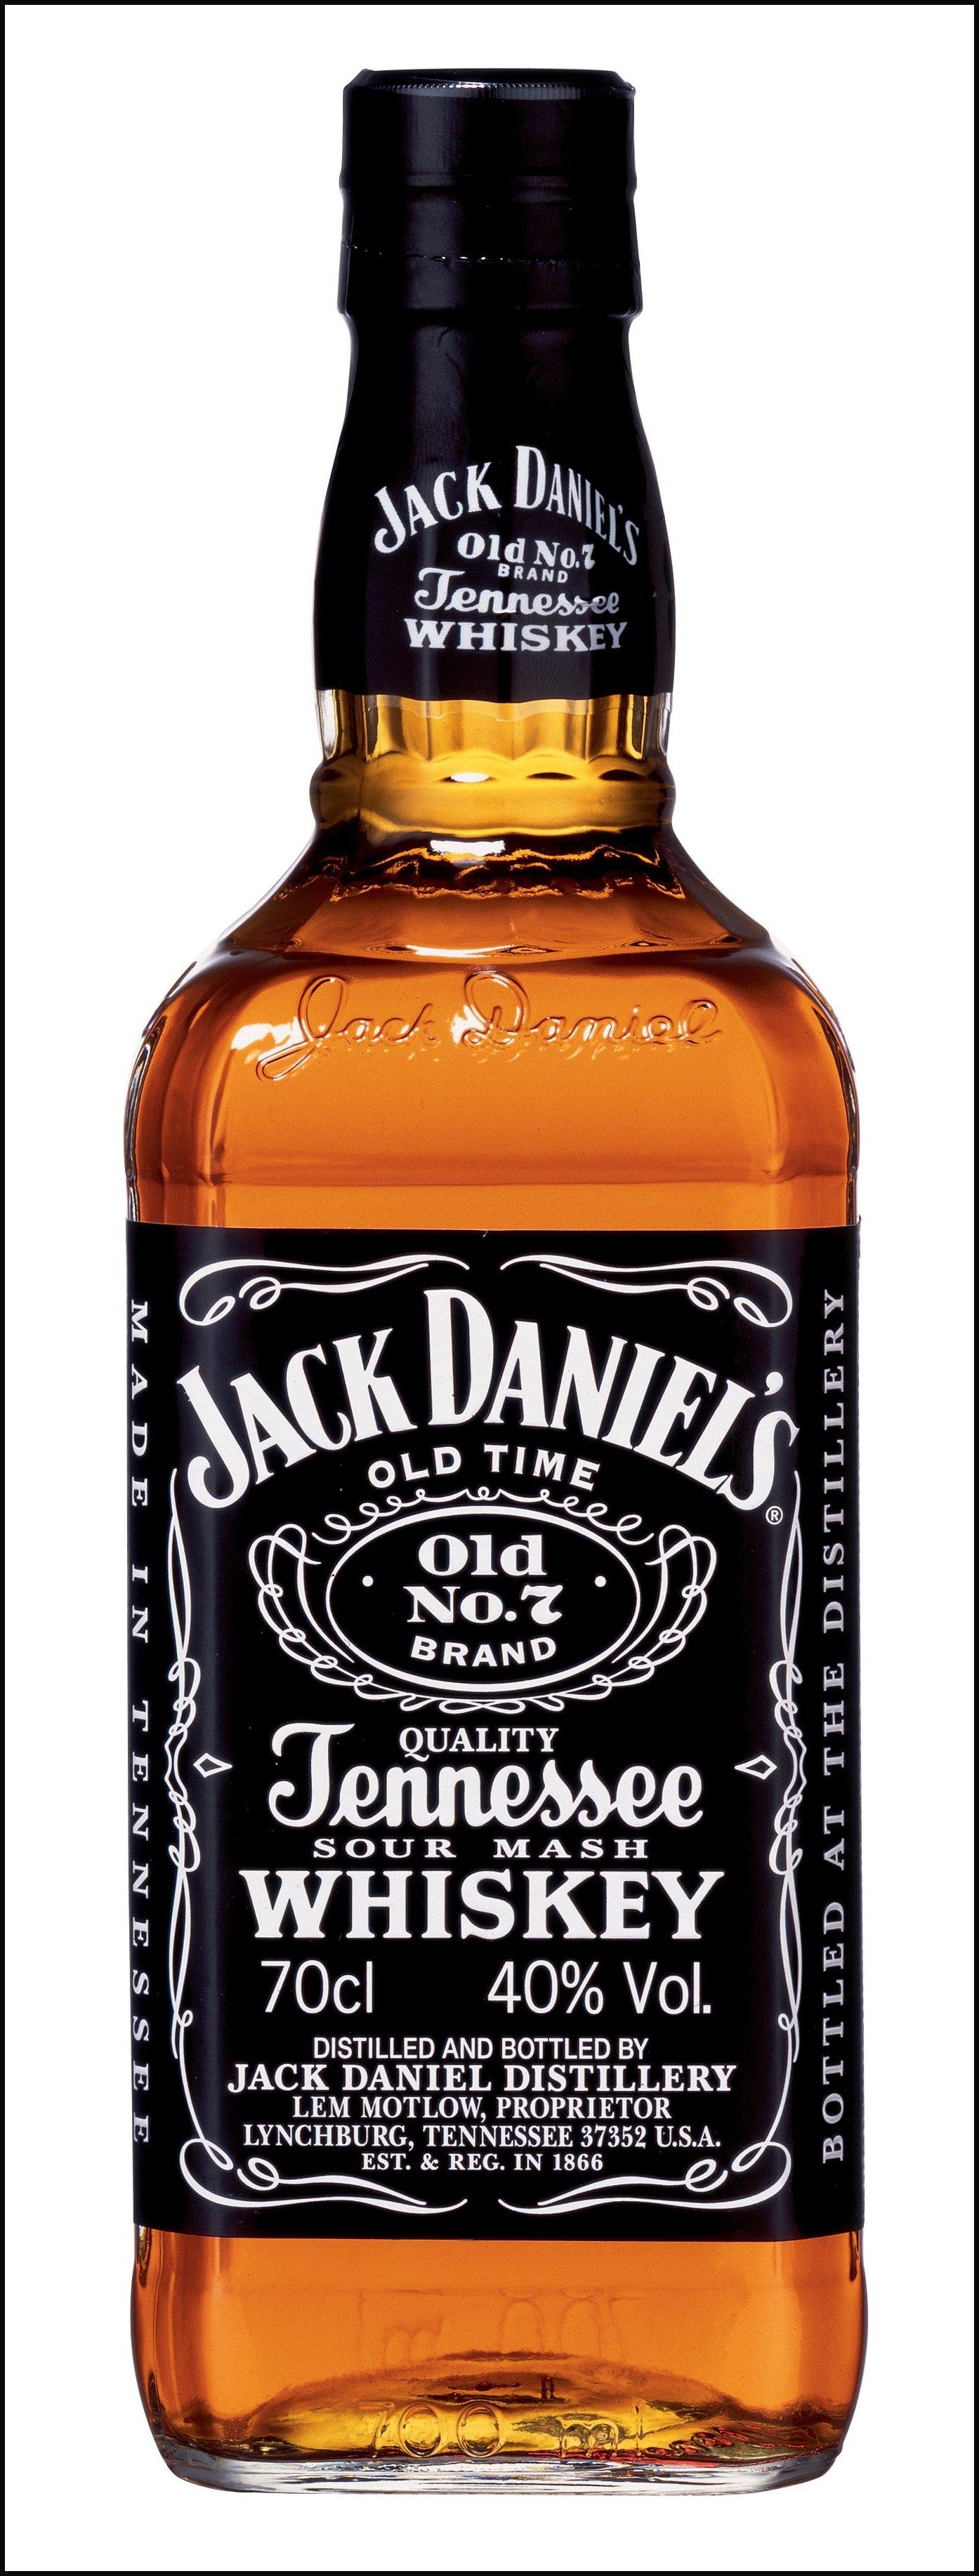 Jack Daniels HD wallpapers, Desktop wallpaper - most viewed